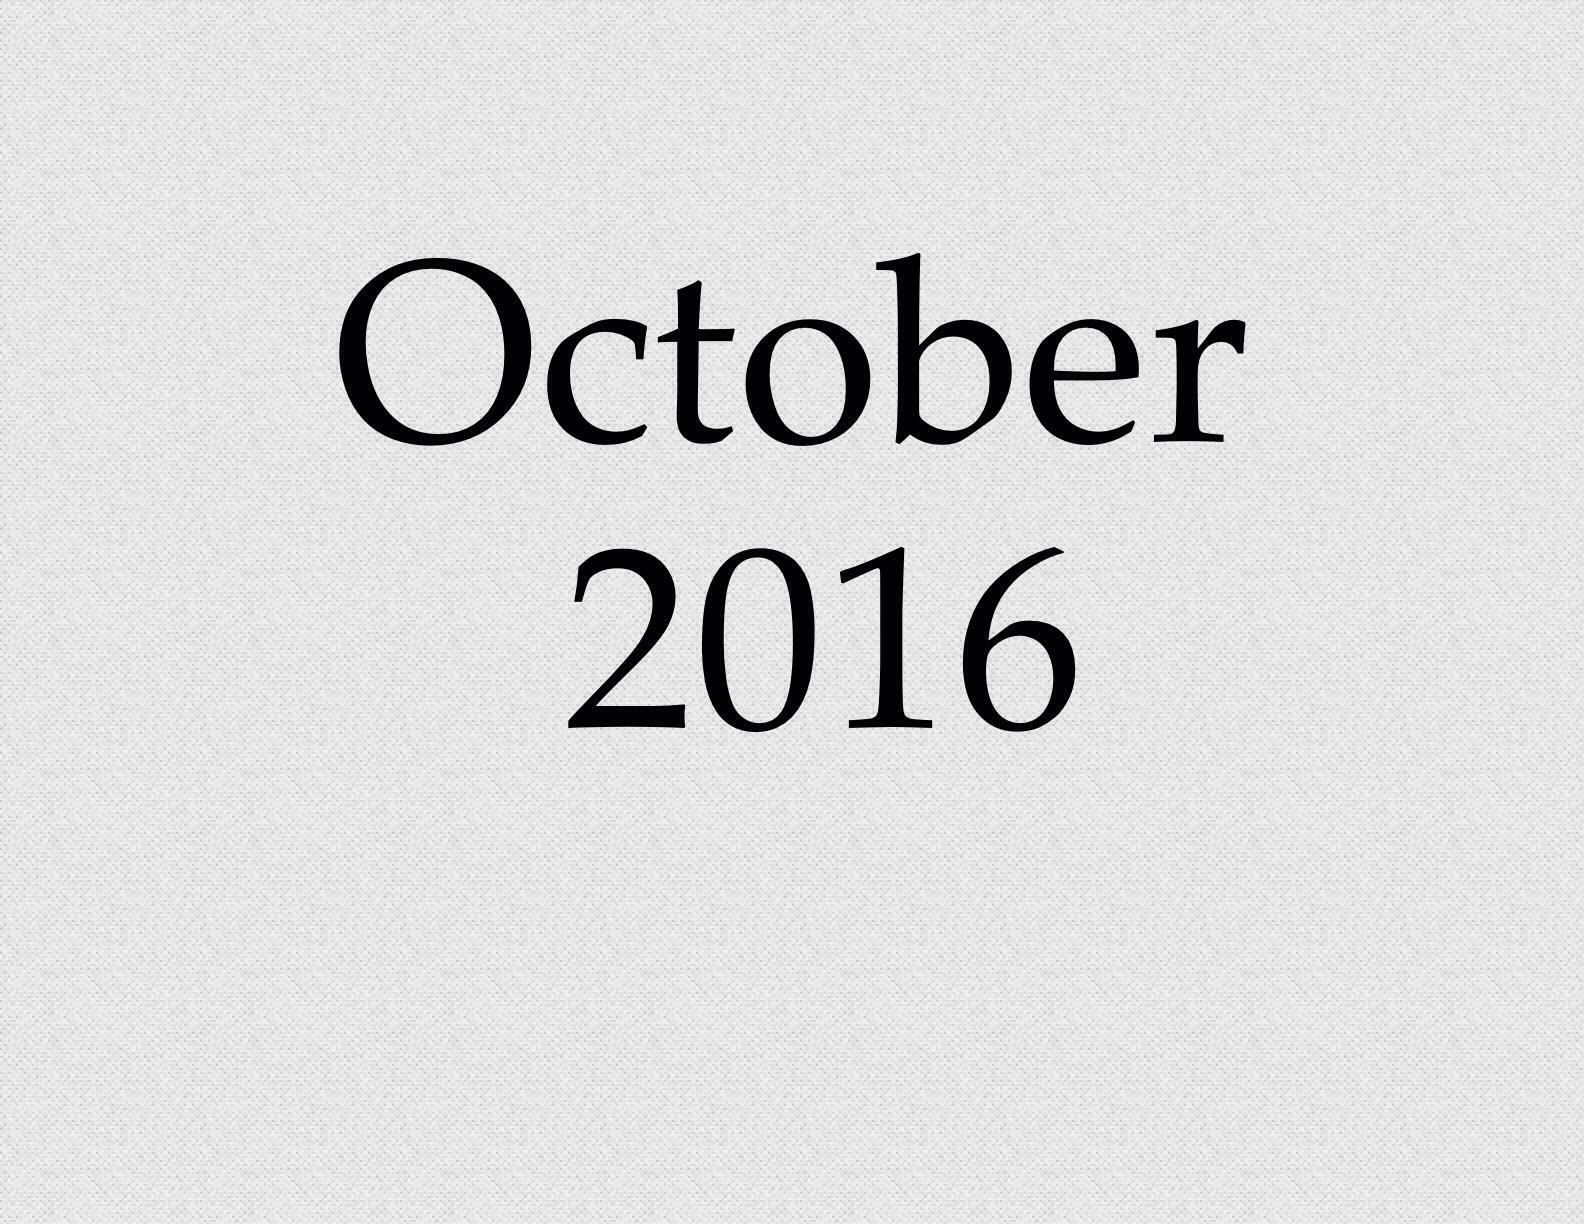 Photo Oct 08, 10 31 24 AM.jpg